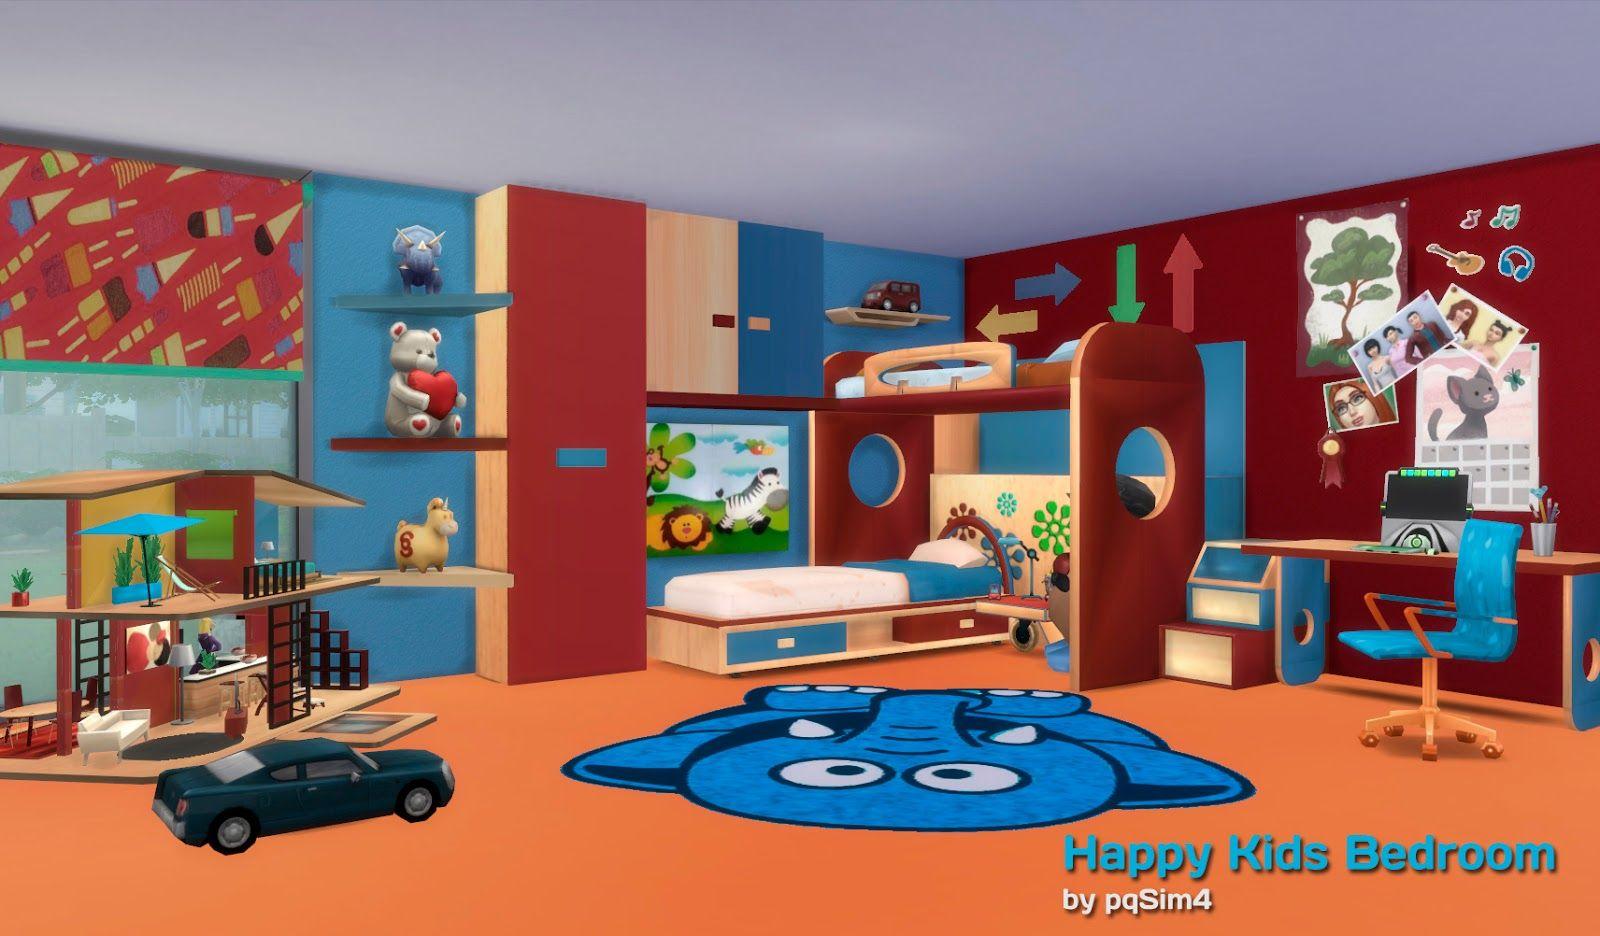 Sims Bedroom Sims 4 Dormitorio Happy Kids Pqsim4 Sims Pinterest Kid